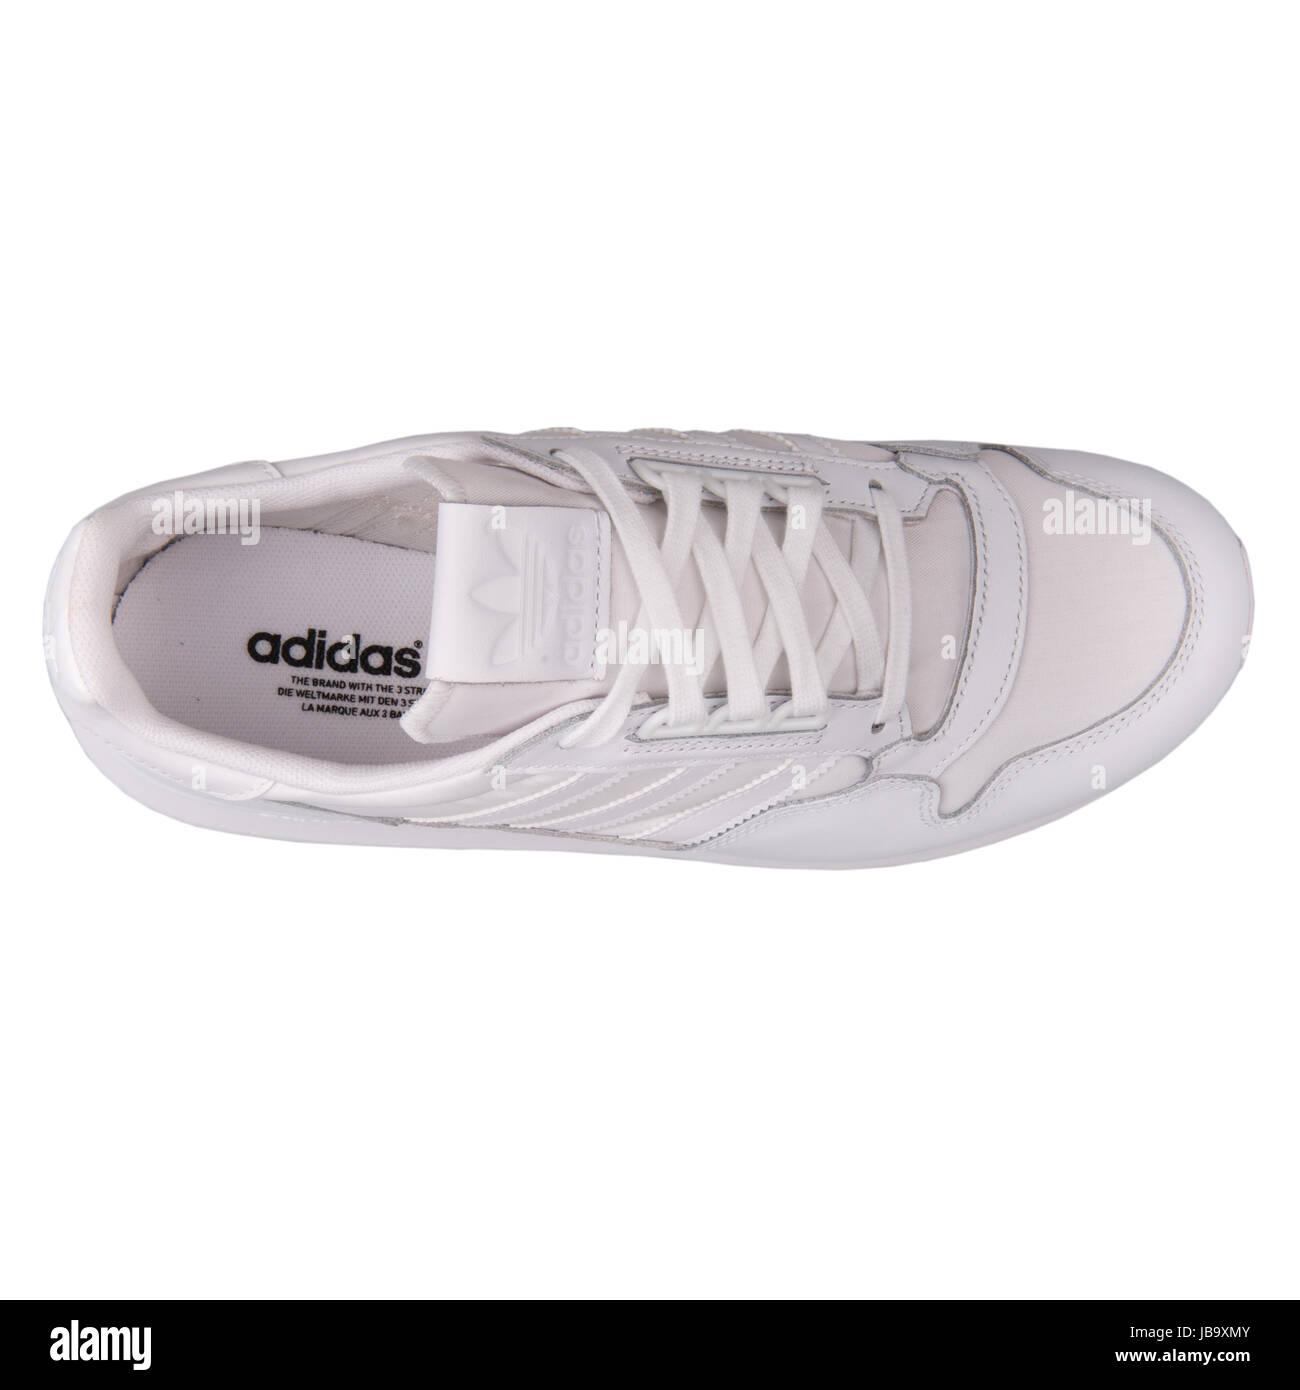 4cc45eab678 Adidas ZX 500 OG W White Women s Sports Shoes - B25600 Stock Photo ...